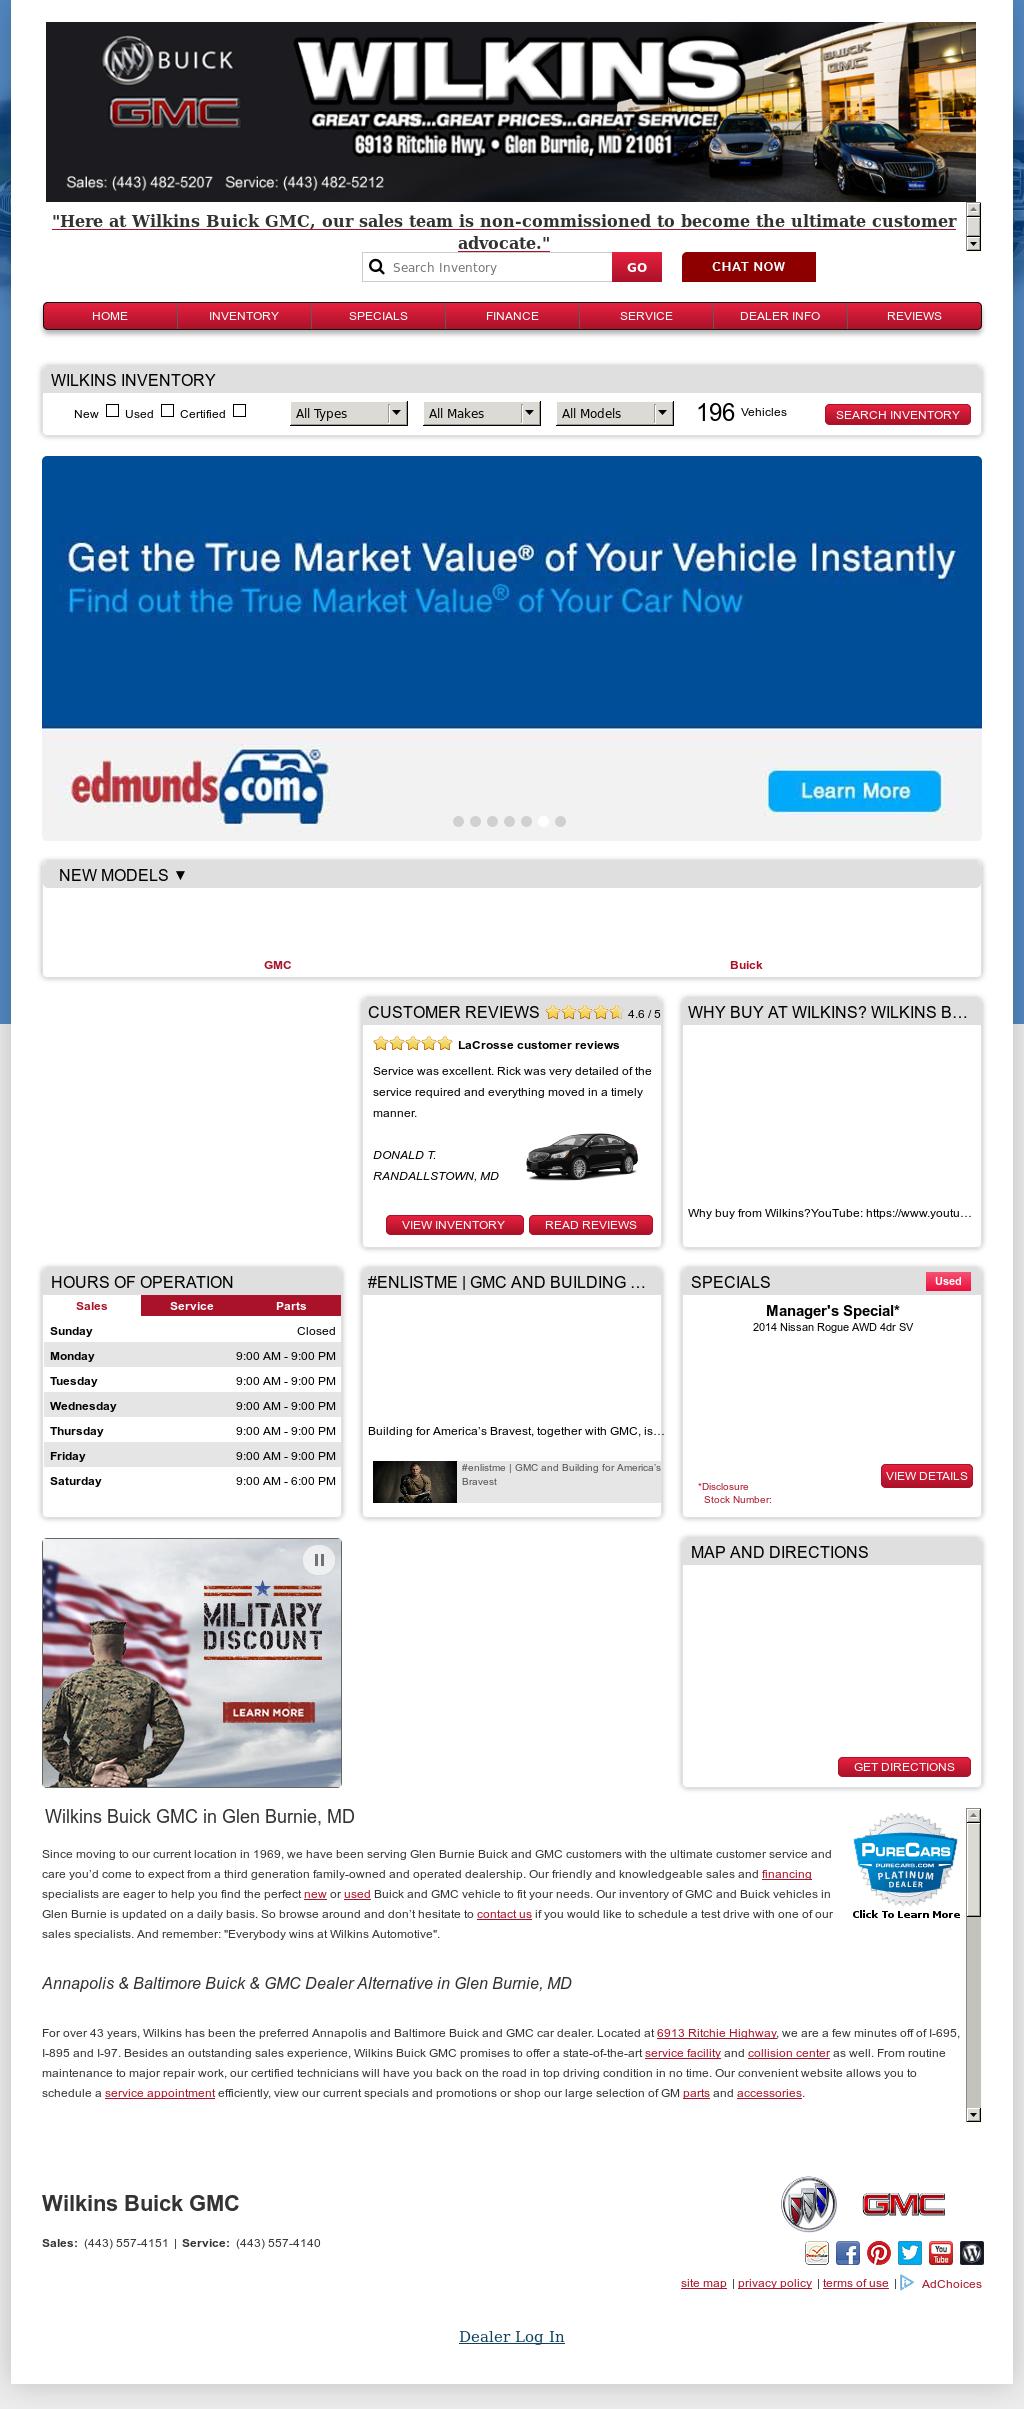 owler pricebuickgmc gmc company salisbury md price competitors and revenue employees profile buick